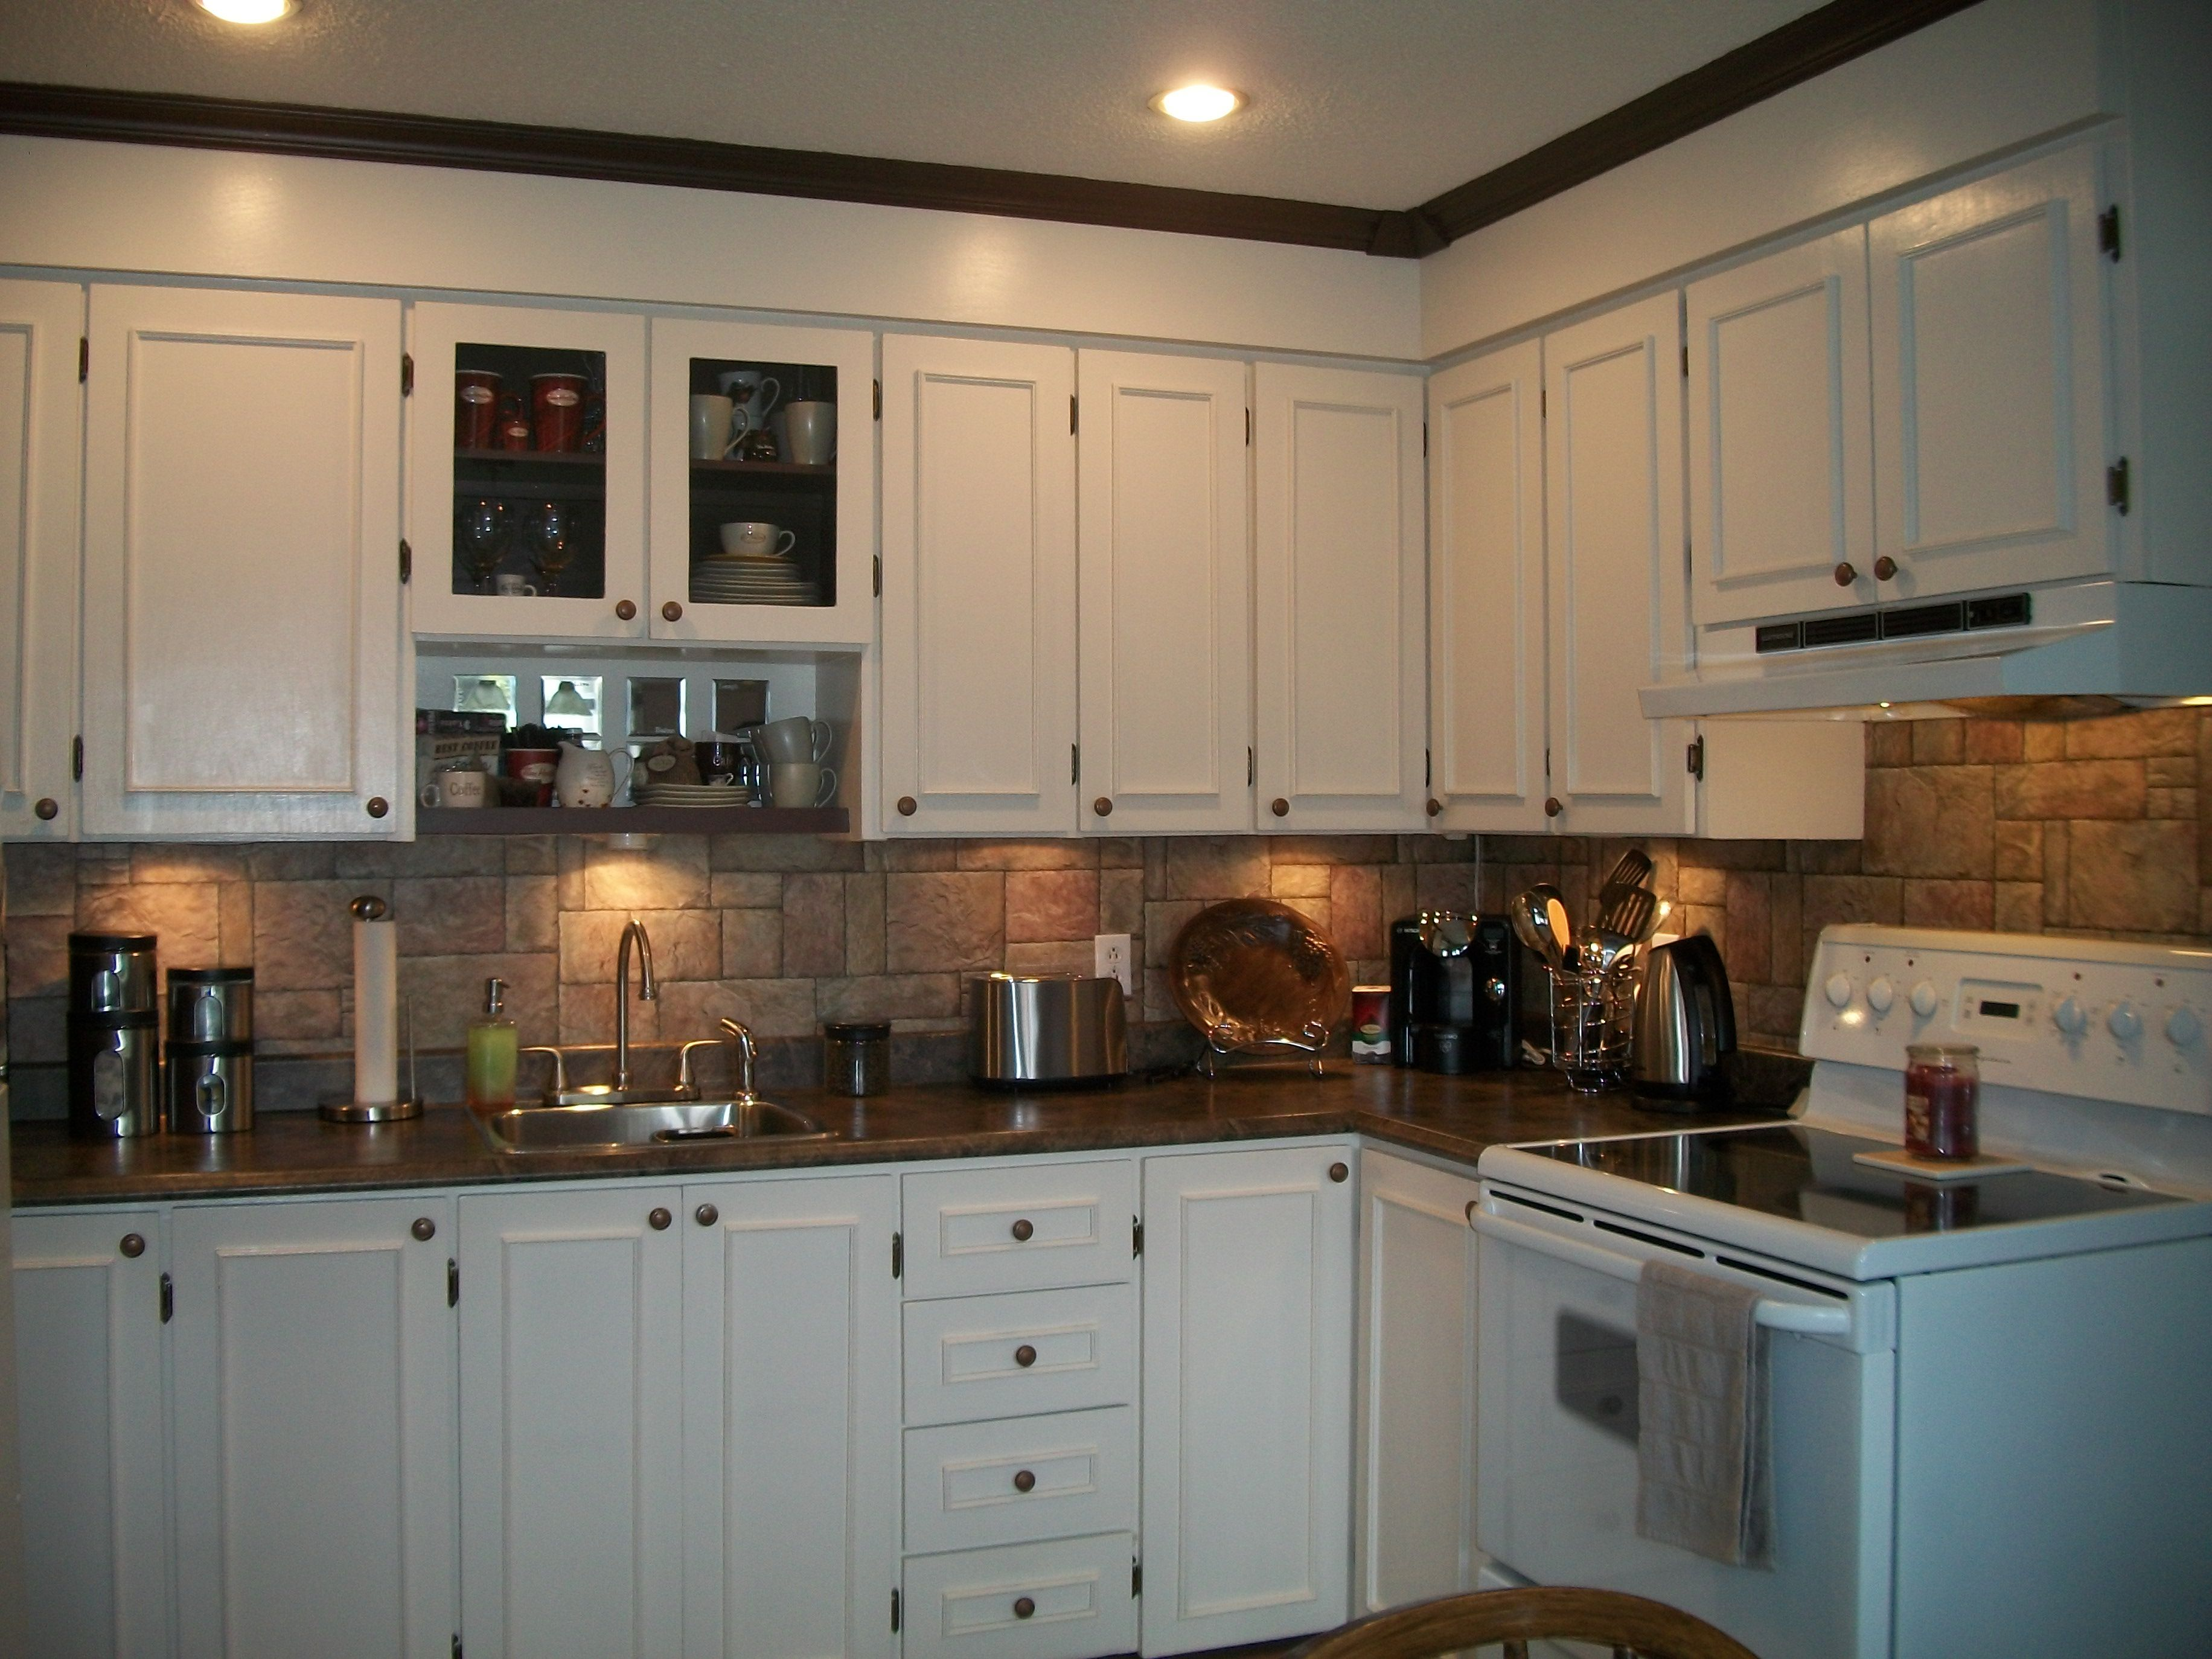 wallpaper kitchen backsplash lighting fixtures for around the casa pinterest